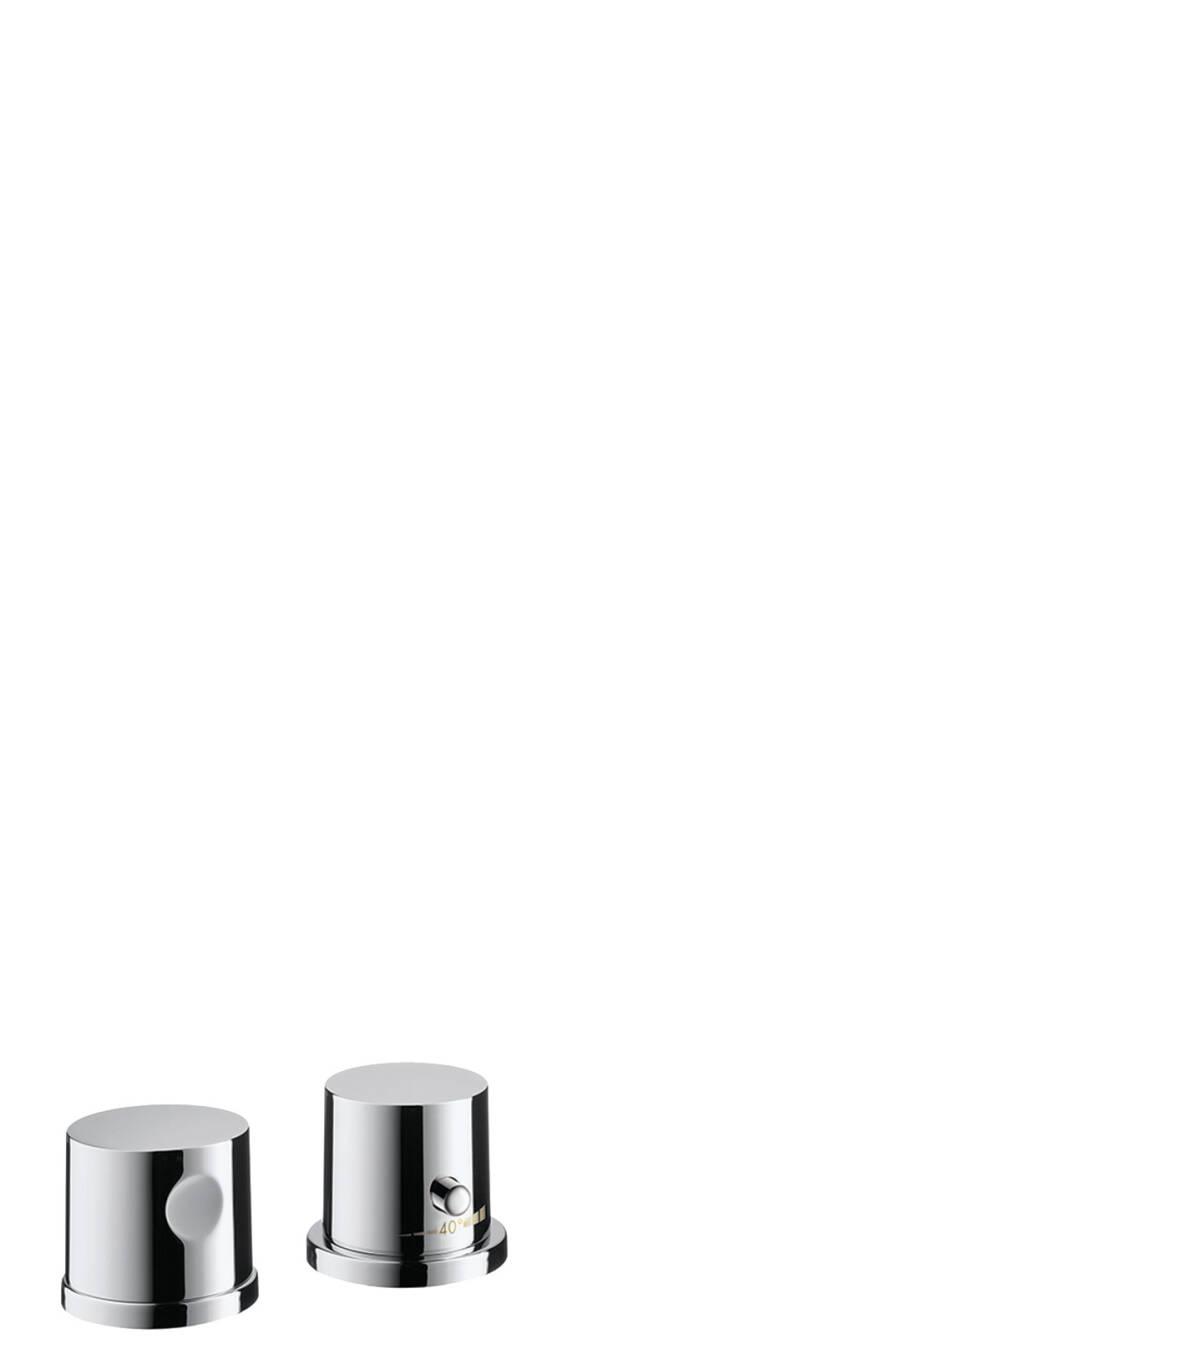 2-hole rim mounted thermostatic bath mixer, Polished Nickel, 38480830